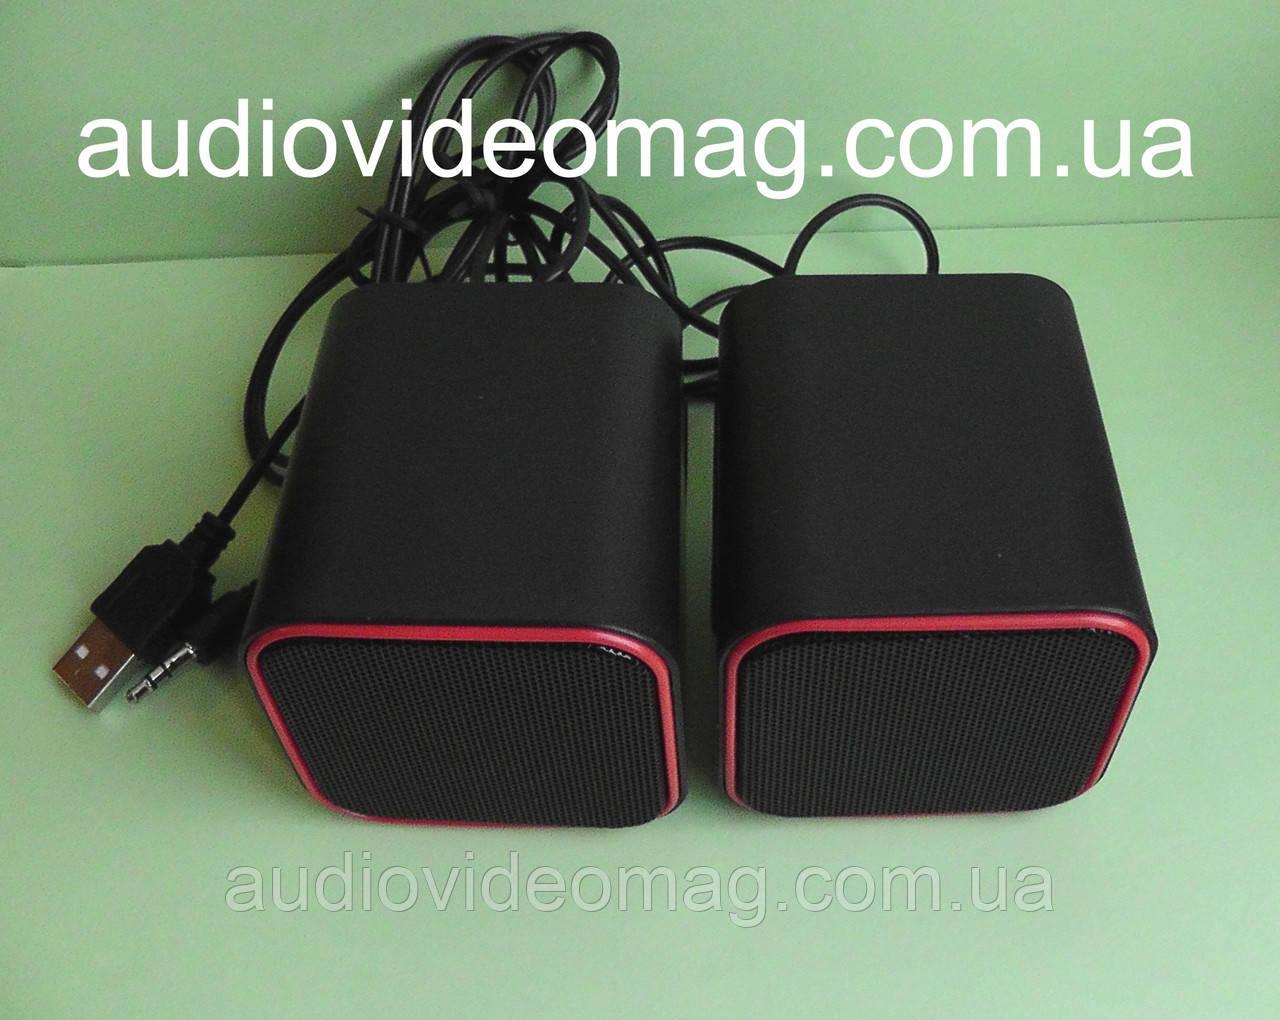 Стерео колонки USB SK-473